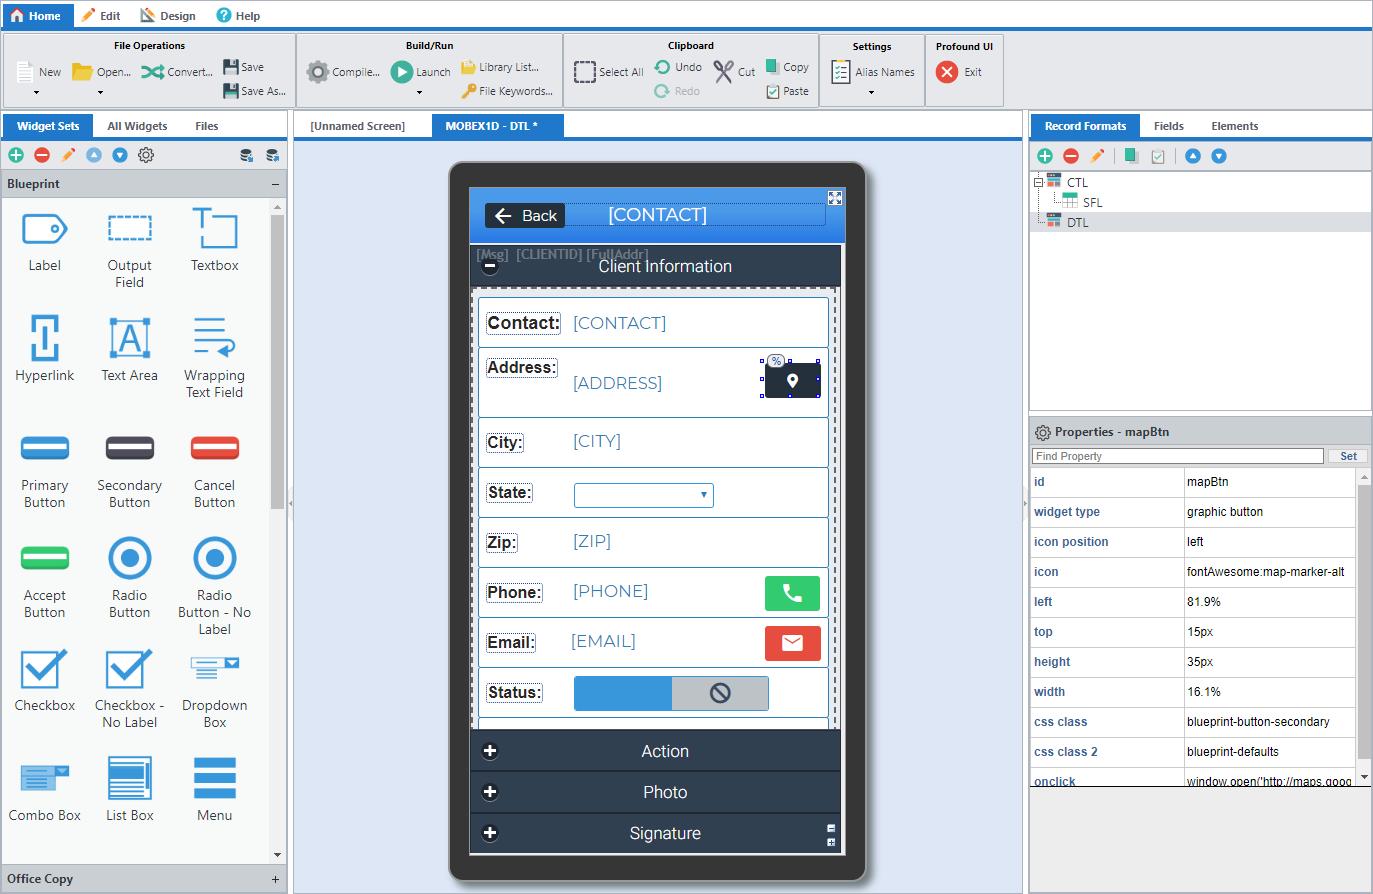 Profound UI Mobile Editor